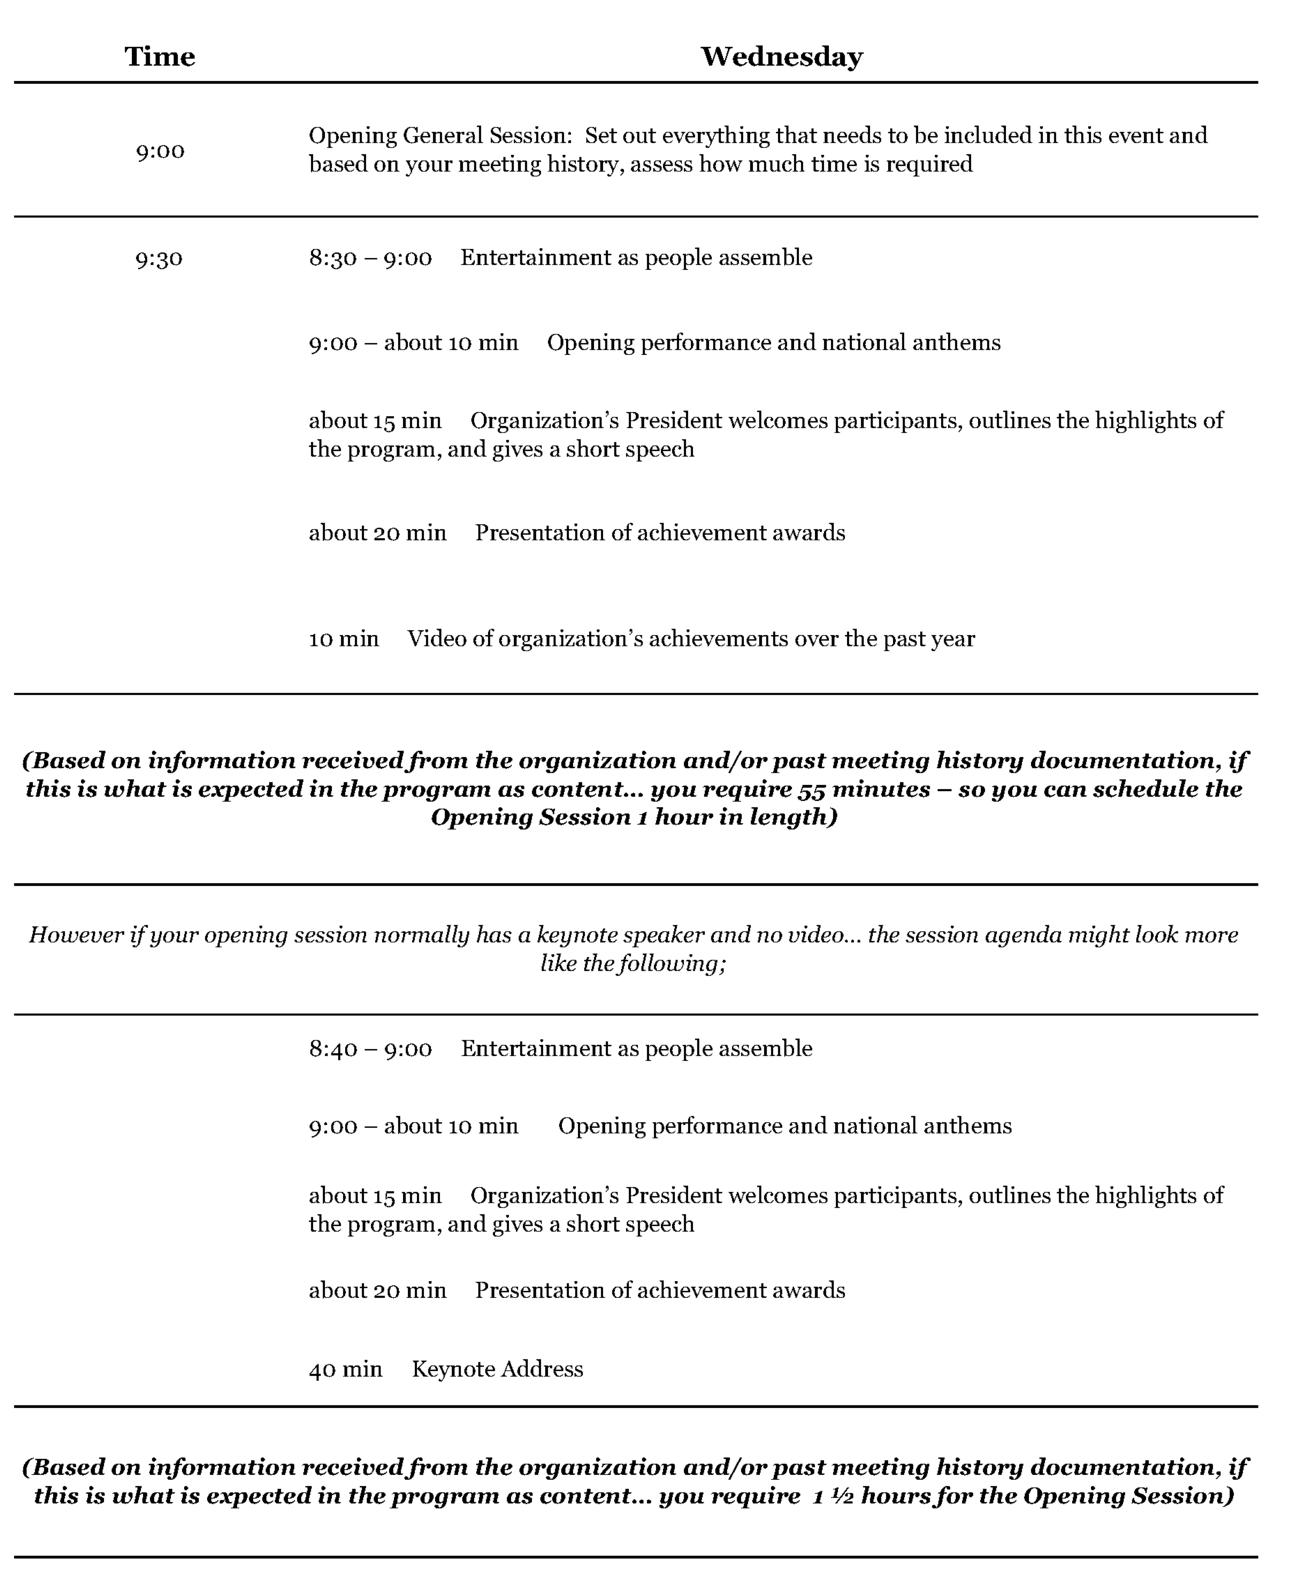 Critical Path Chart.png